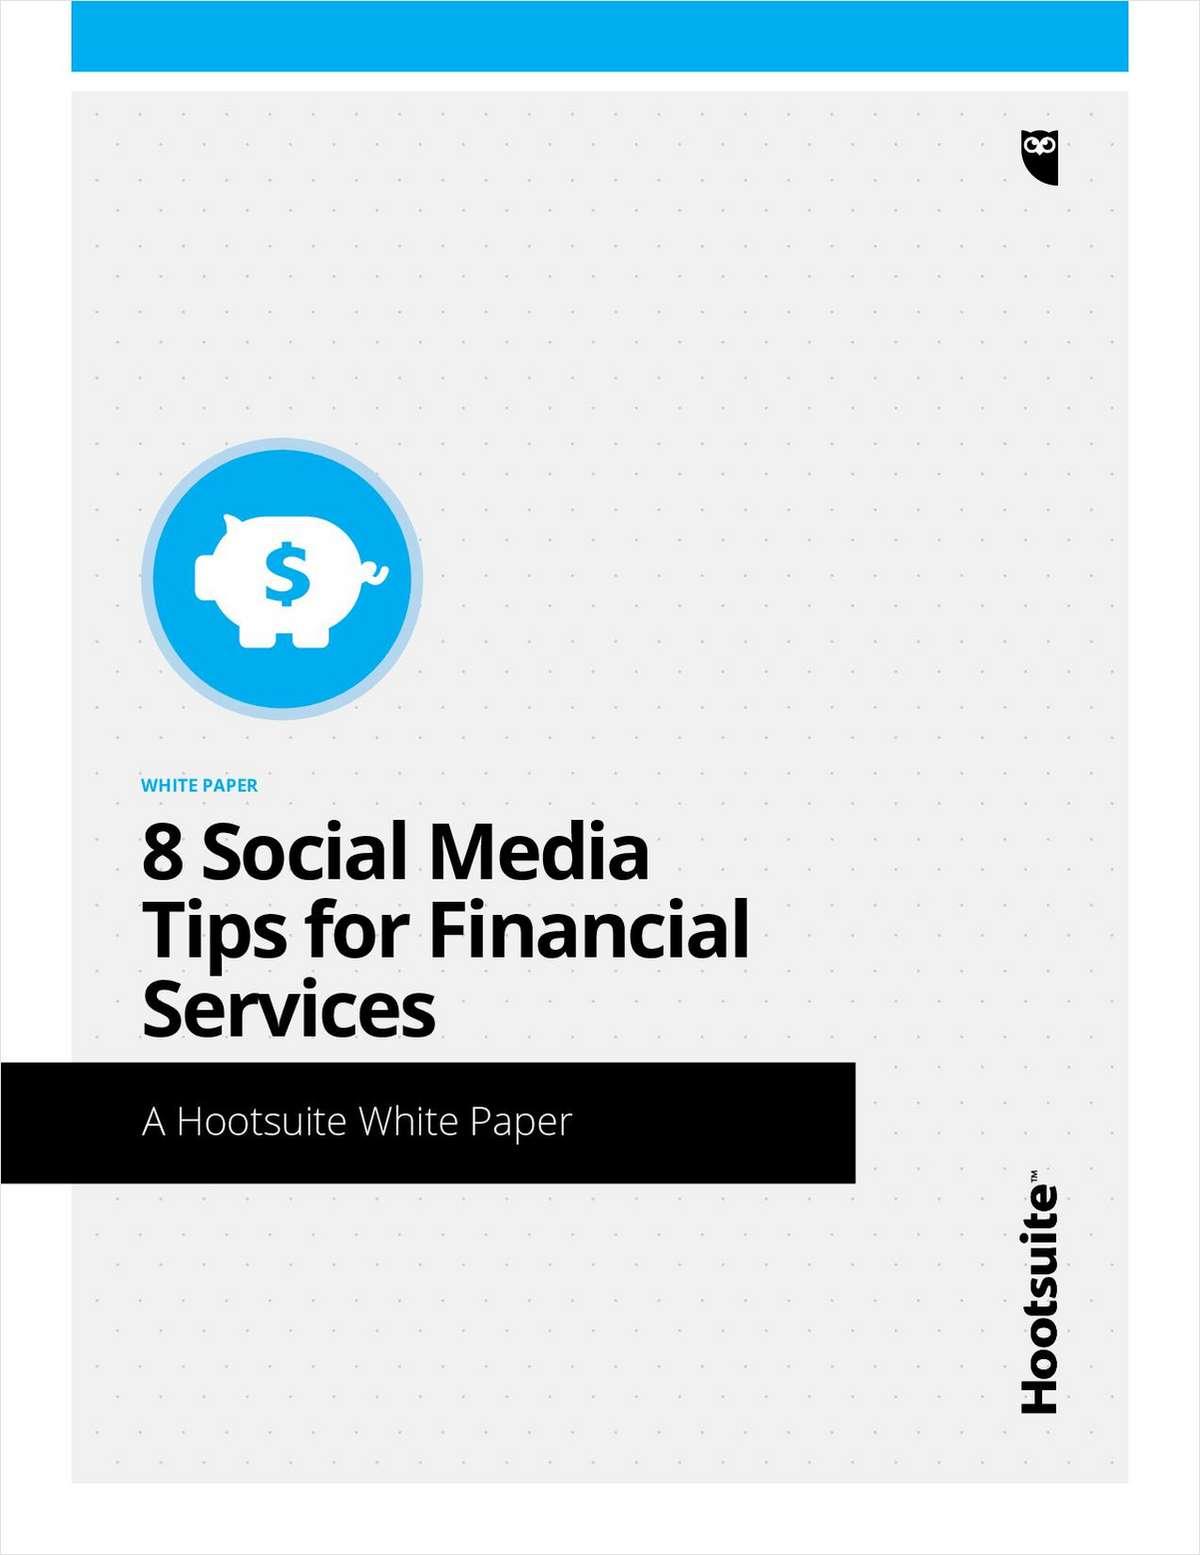 8 Social Media Tips for Financial Services